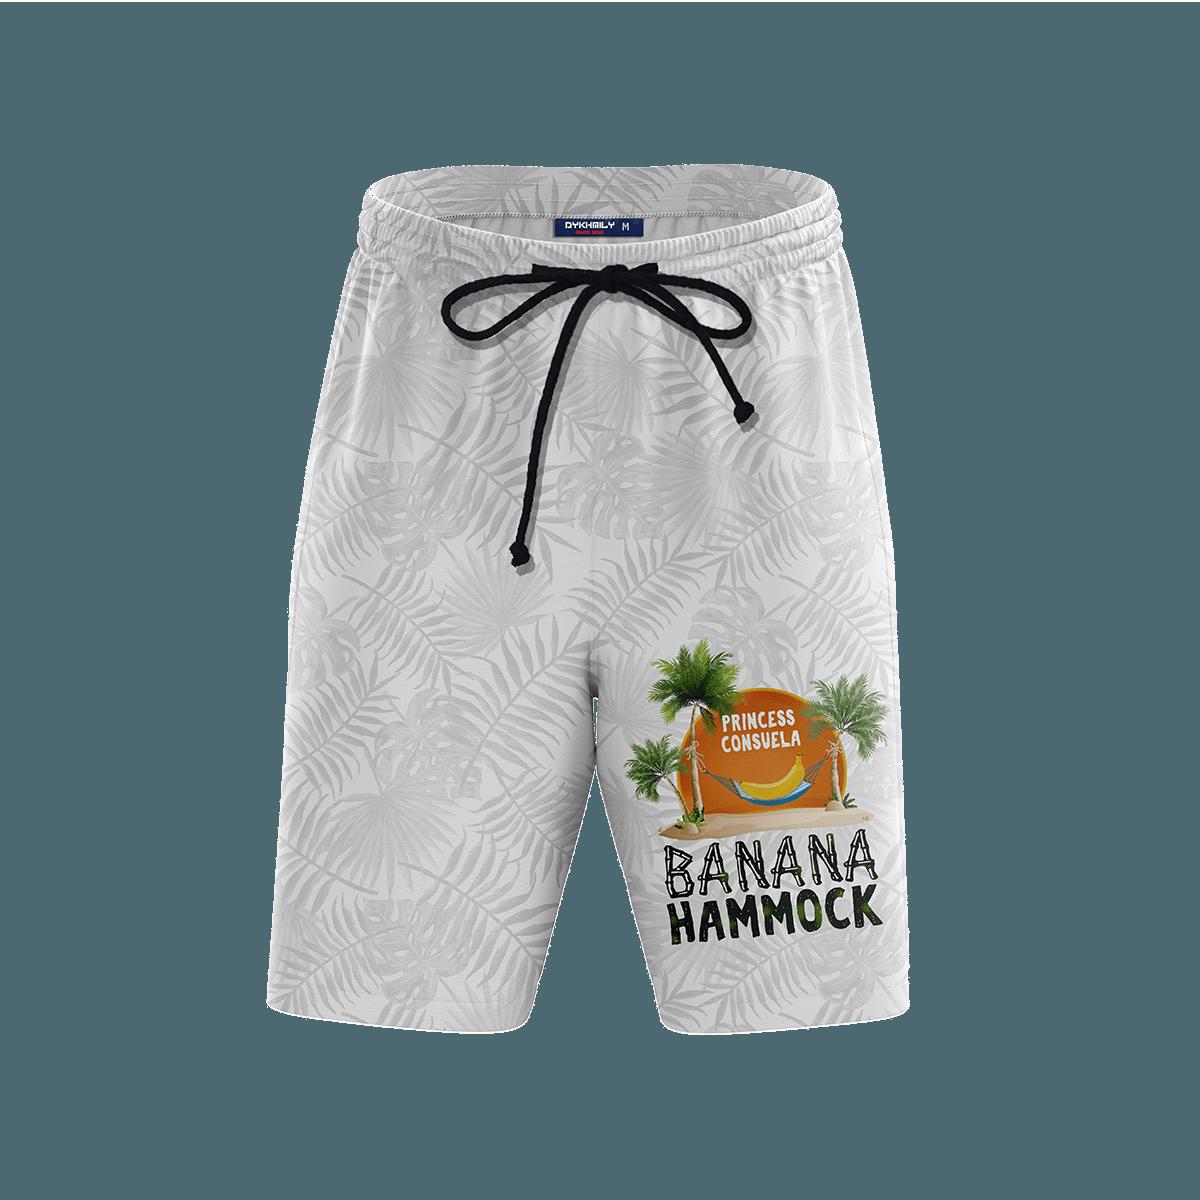 Banana Hammock Beach Shorts FDM3107 S Official Anime Swimsuit Merch